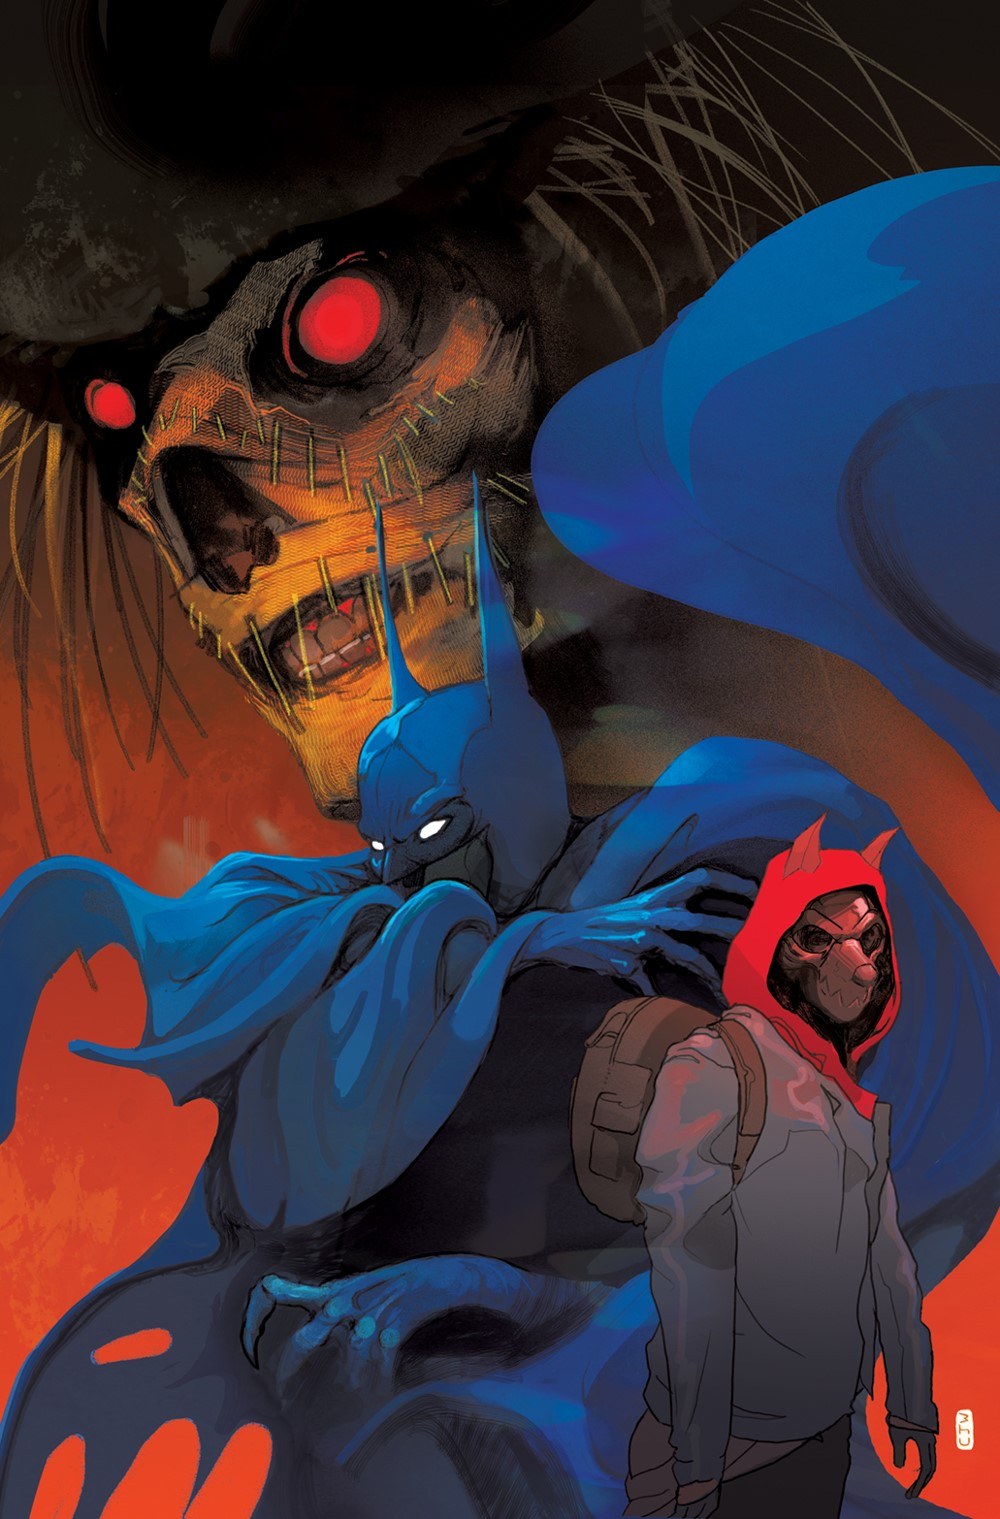 Legends-of-the-Dark-Knight-Cv8-Open-To-Order-Variant DC Comics December 2021 Solicitations